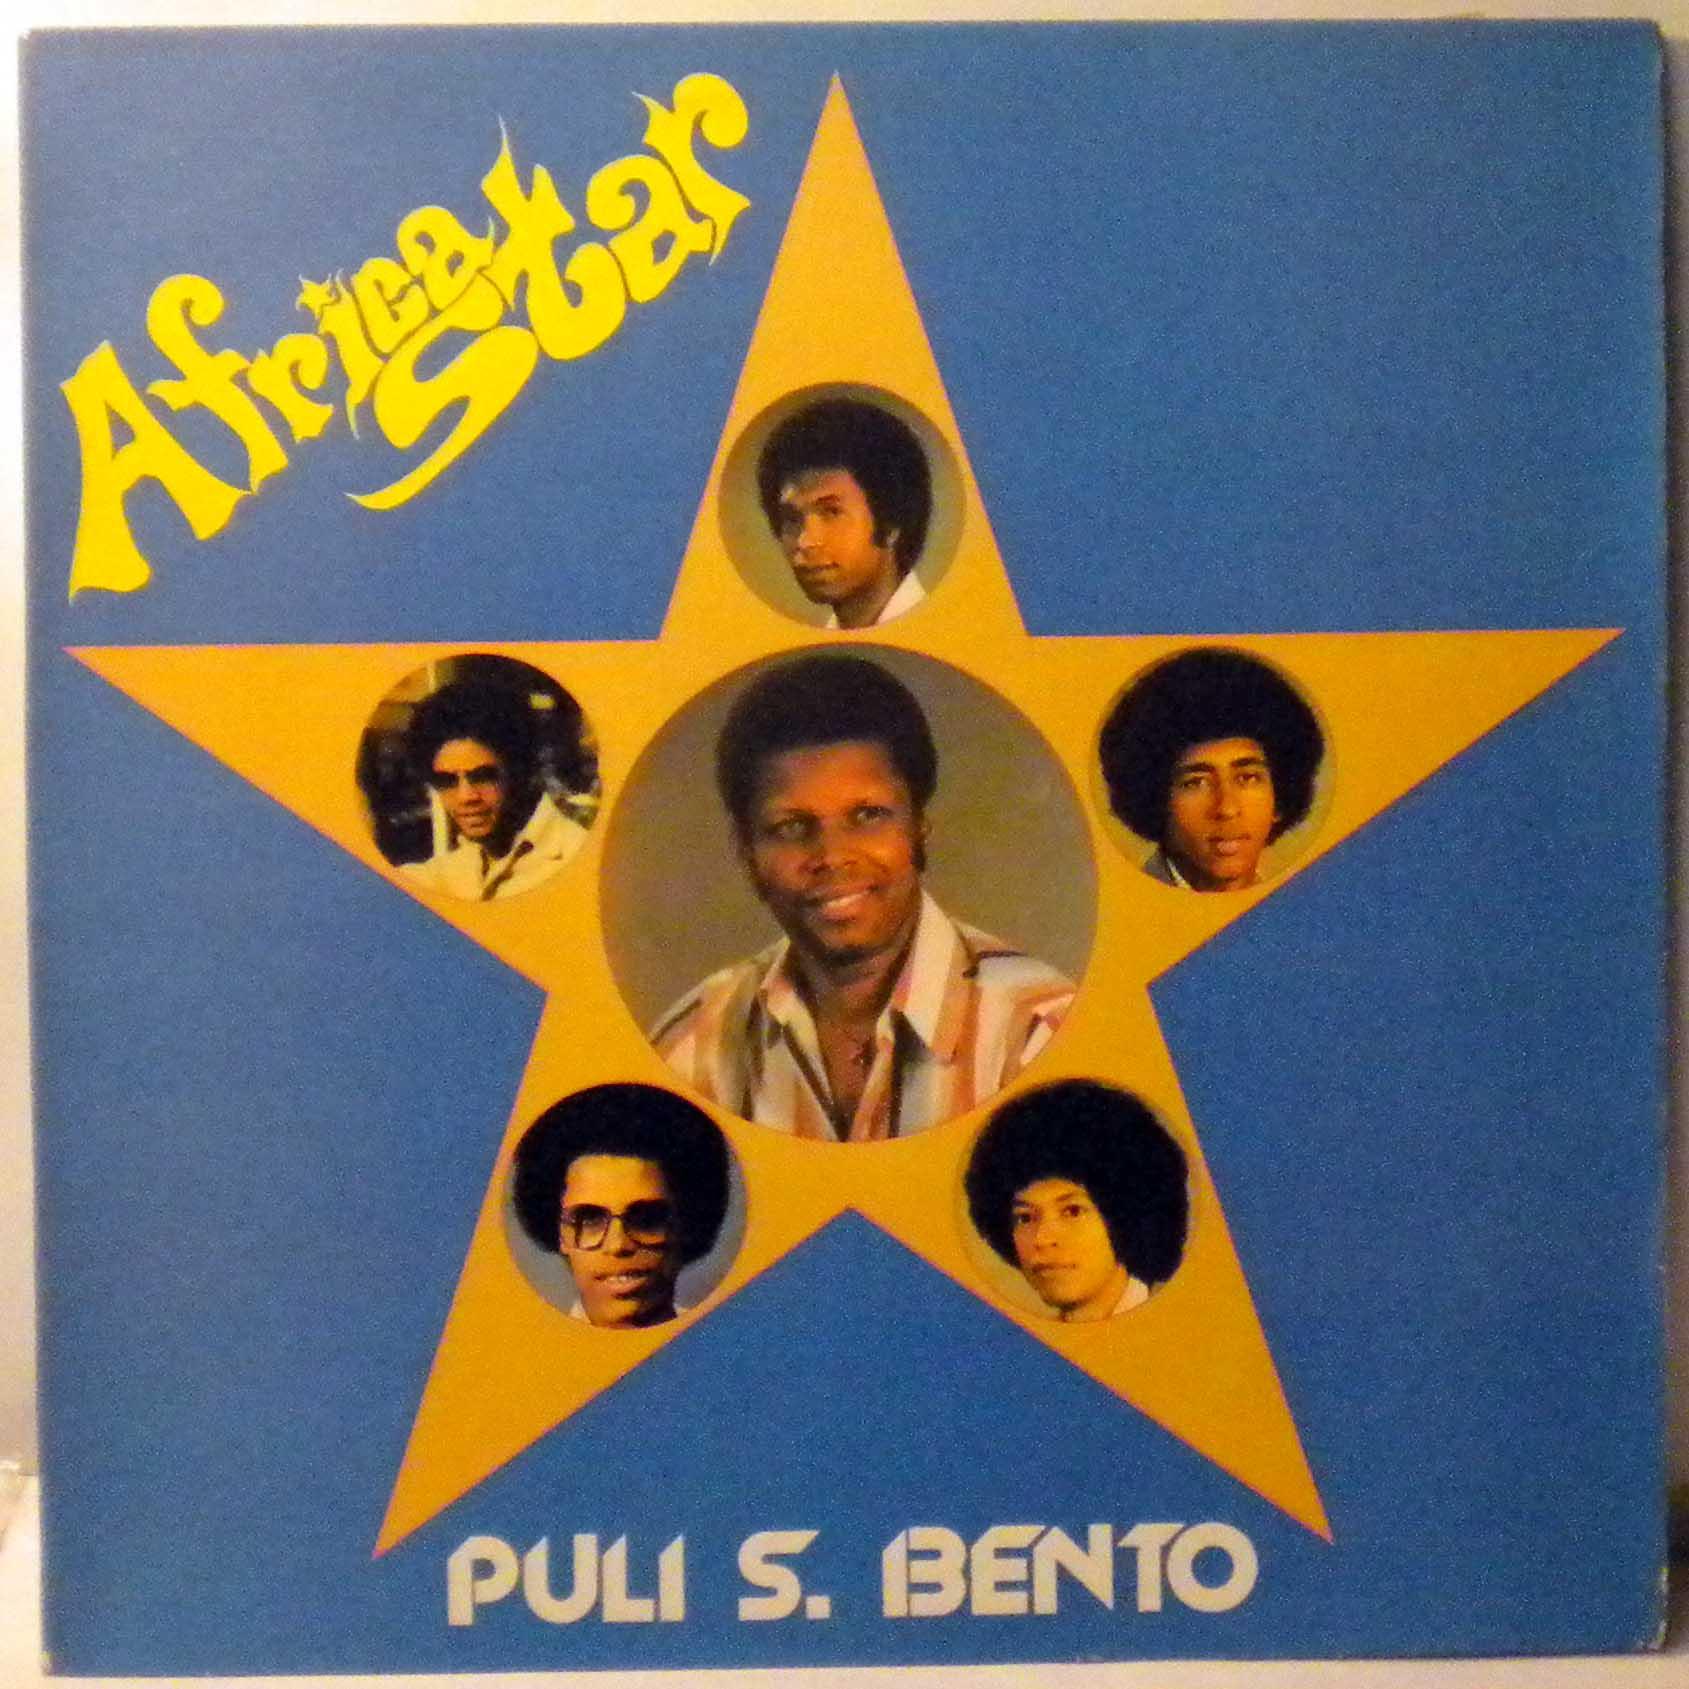 AFRICA STAR - Puli S. Bento - LP